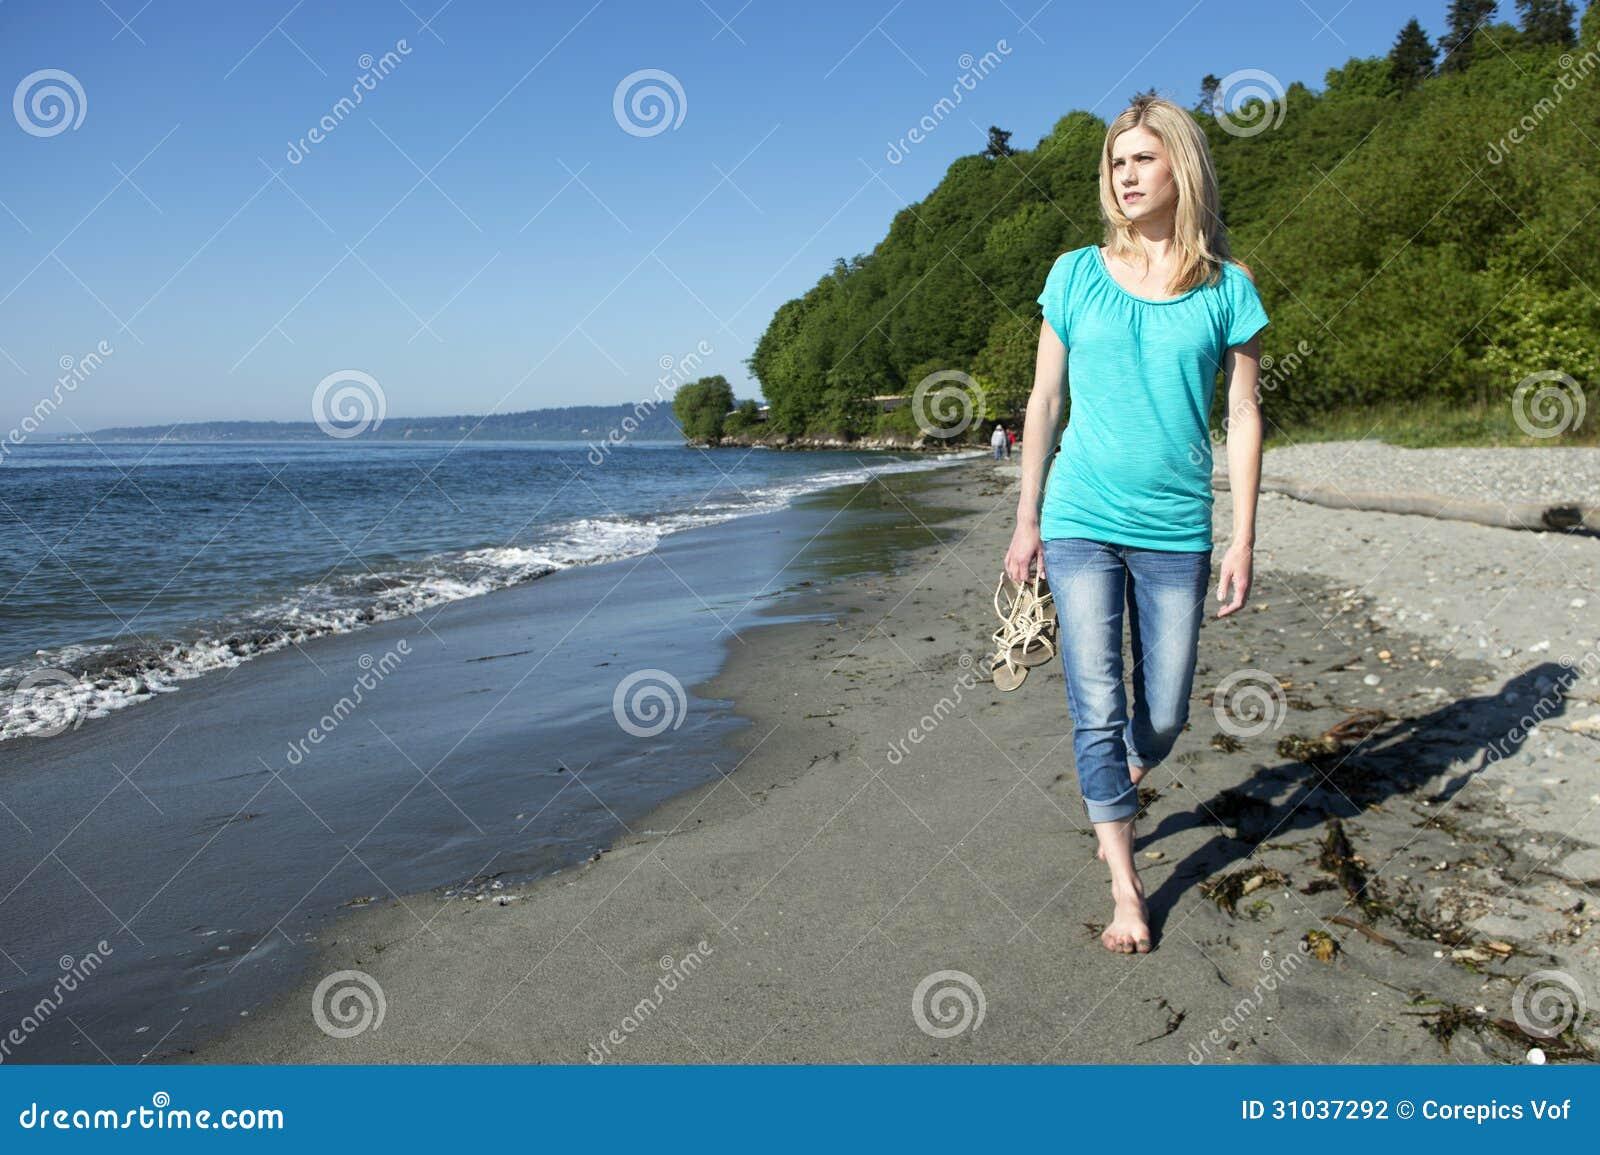 Woman Walking On Beach Stock Photography - Image: 31037292